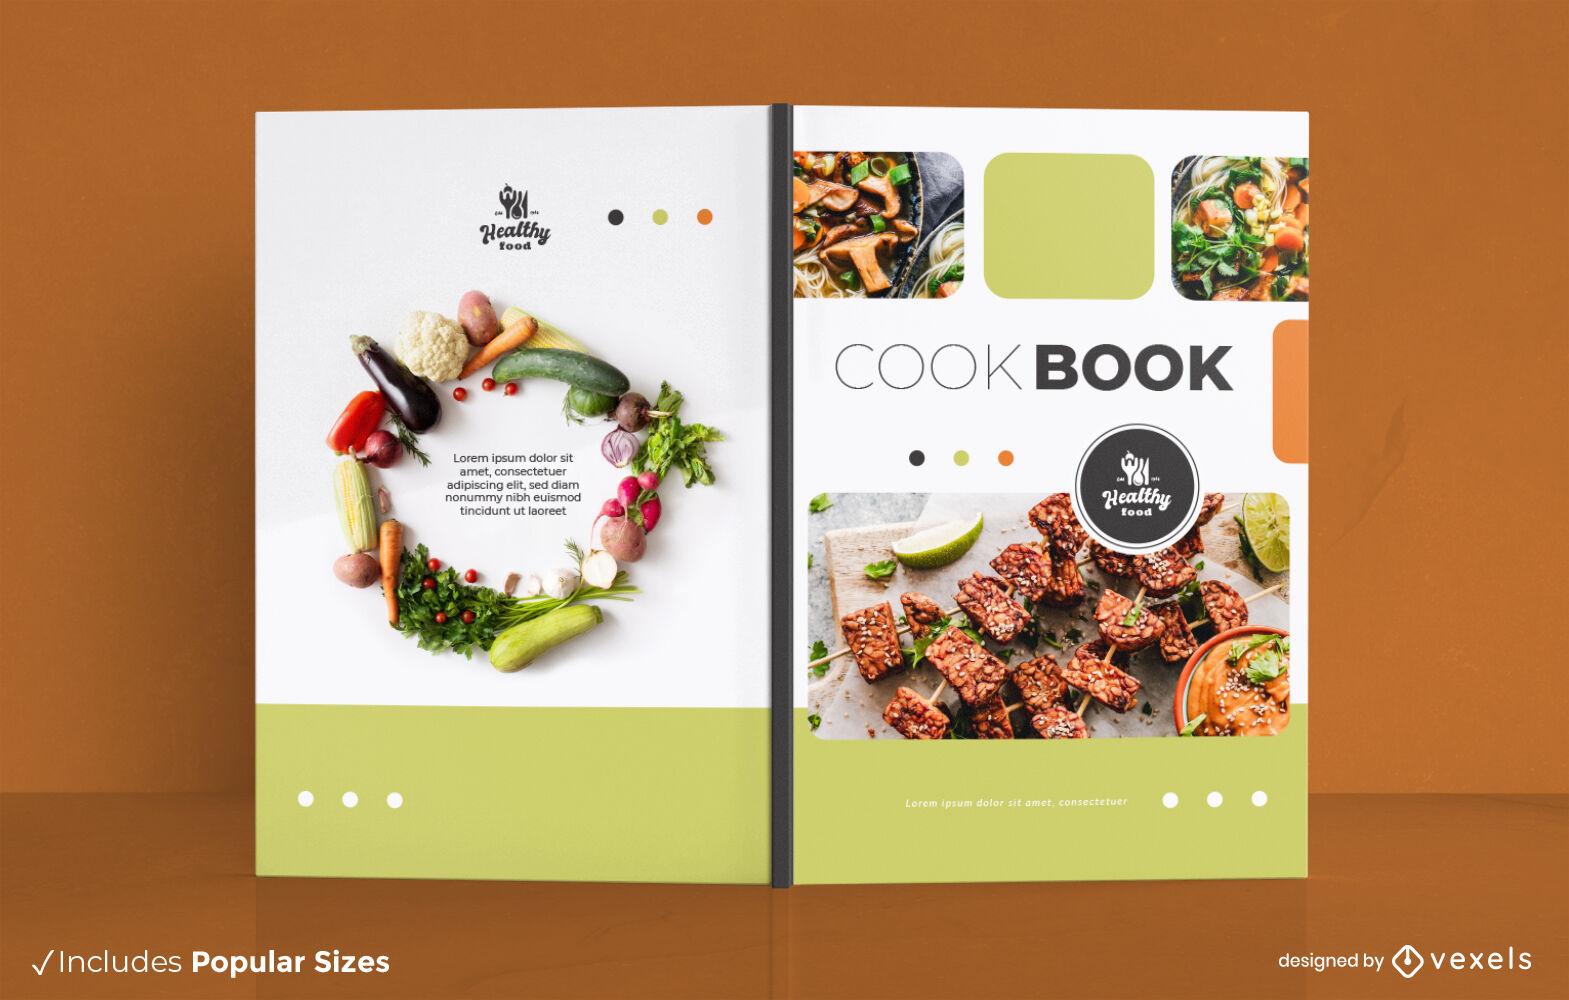 Diseño de portada de libro de recetas de libros de cocina